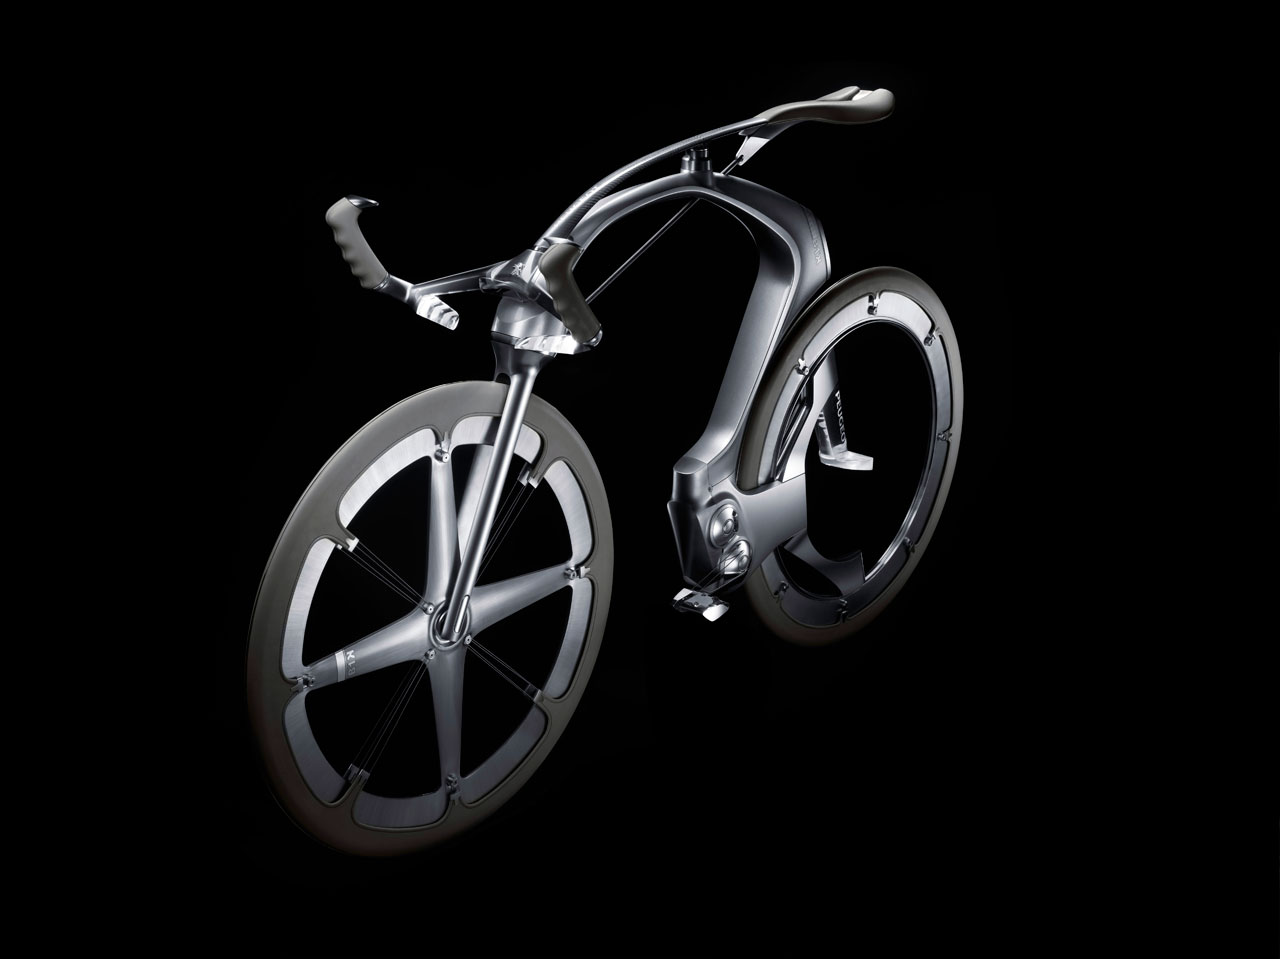 https://i1.wp.com/www.carbodydesign.com/archive/2010/02/peugeot-b1k-bike-concept/Peugeot-B1K-Bike-Concept-2-lg.jpg